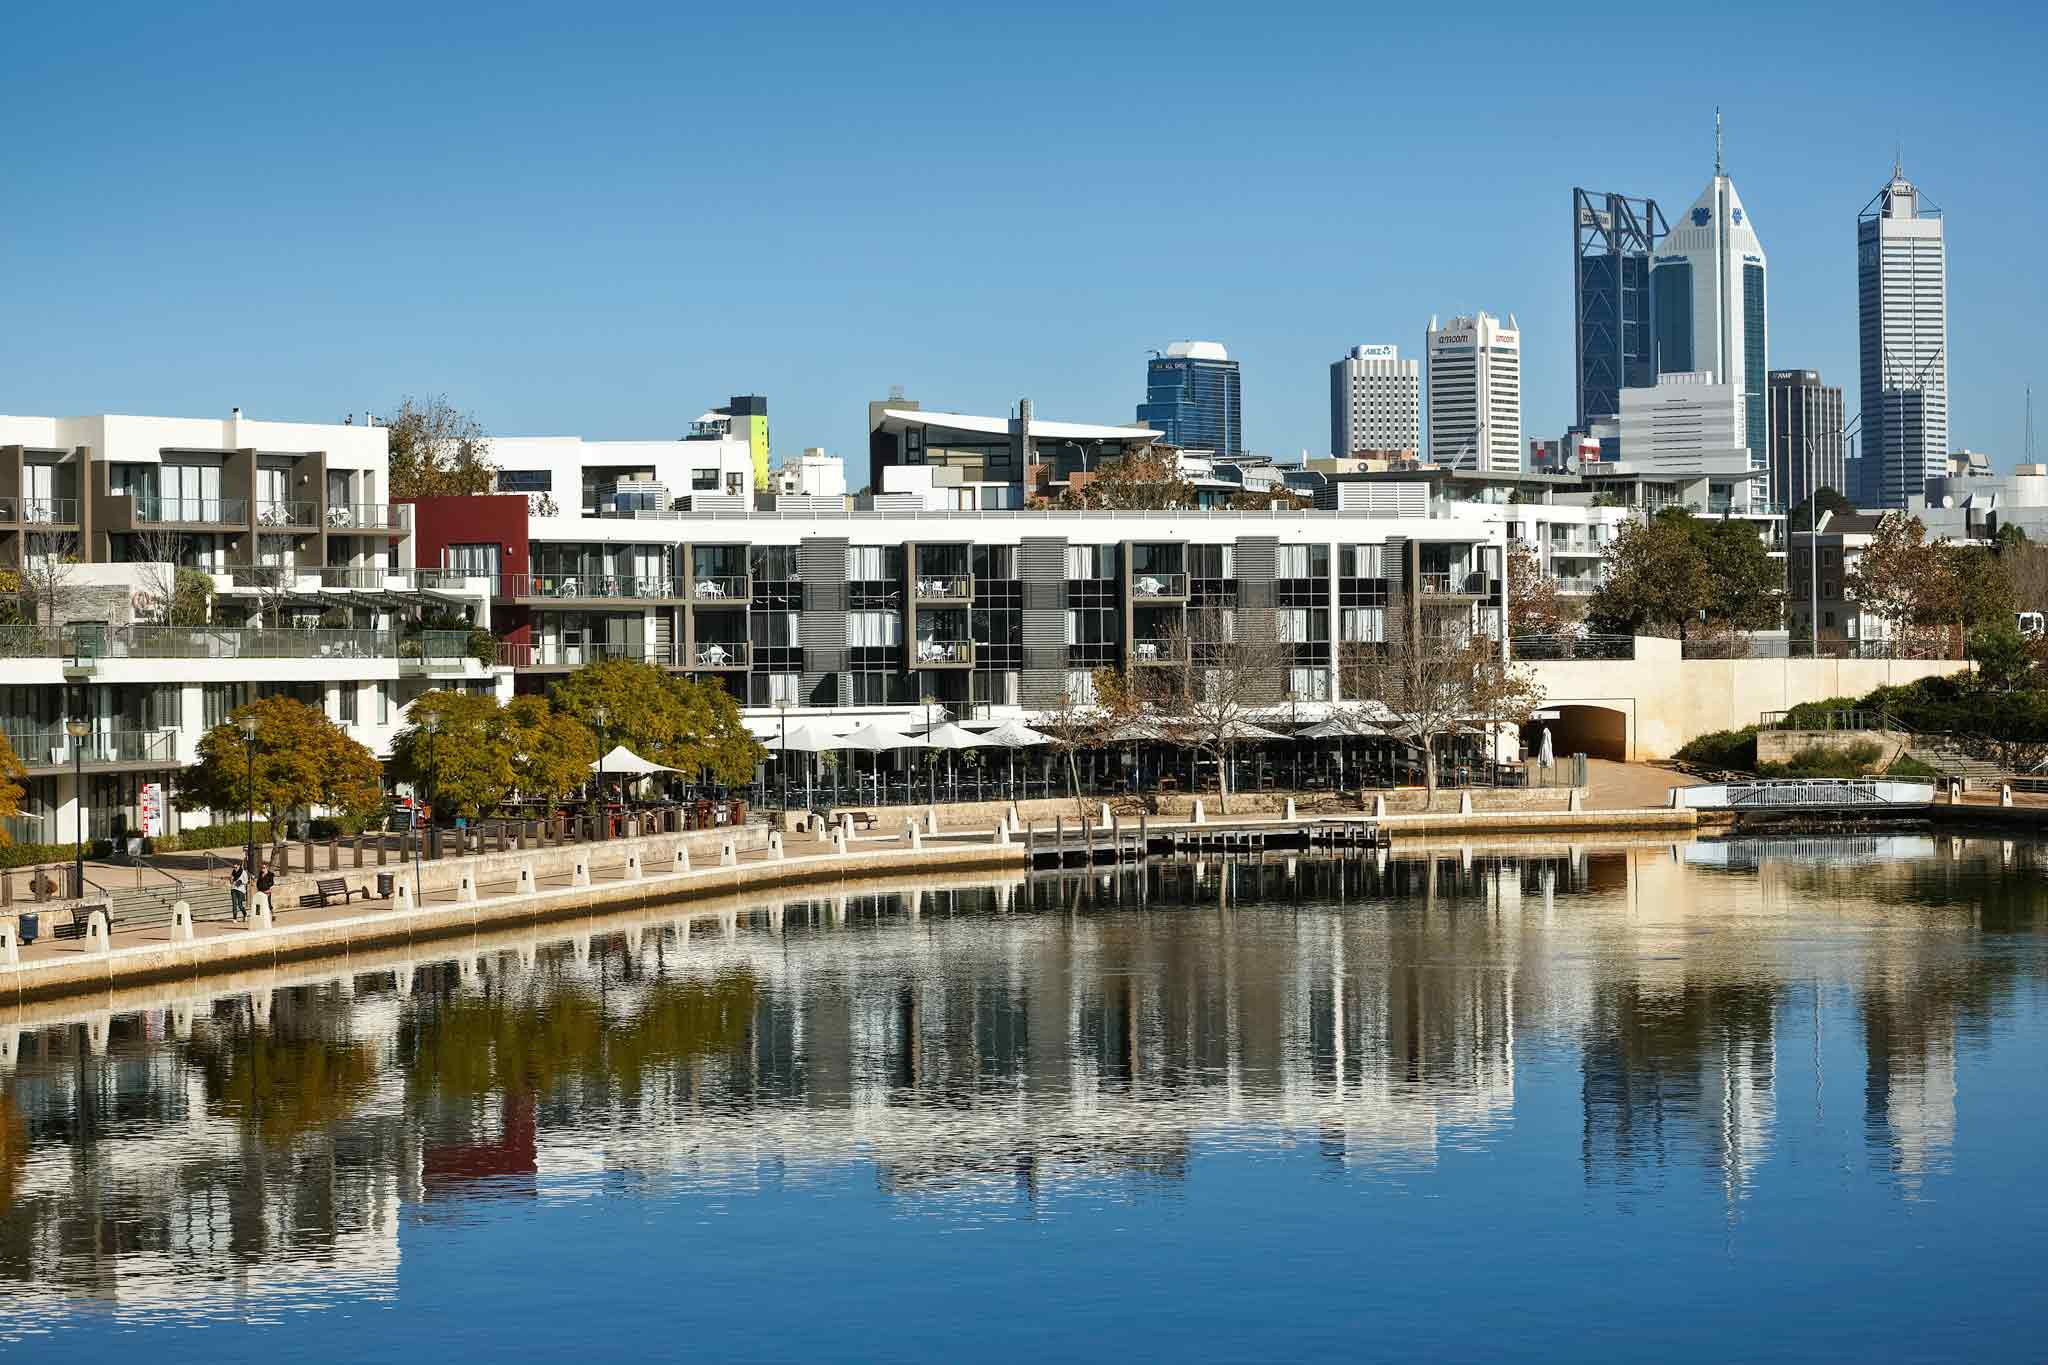 Hotel - The Sebel East Perth